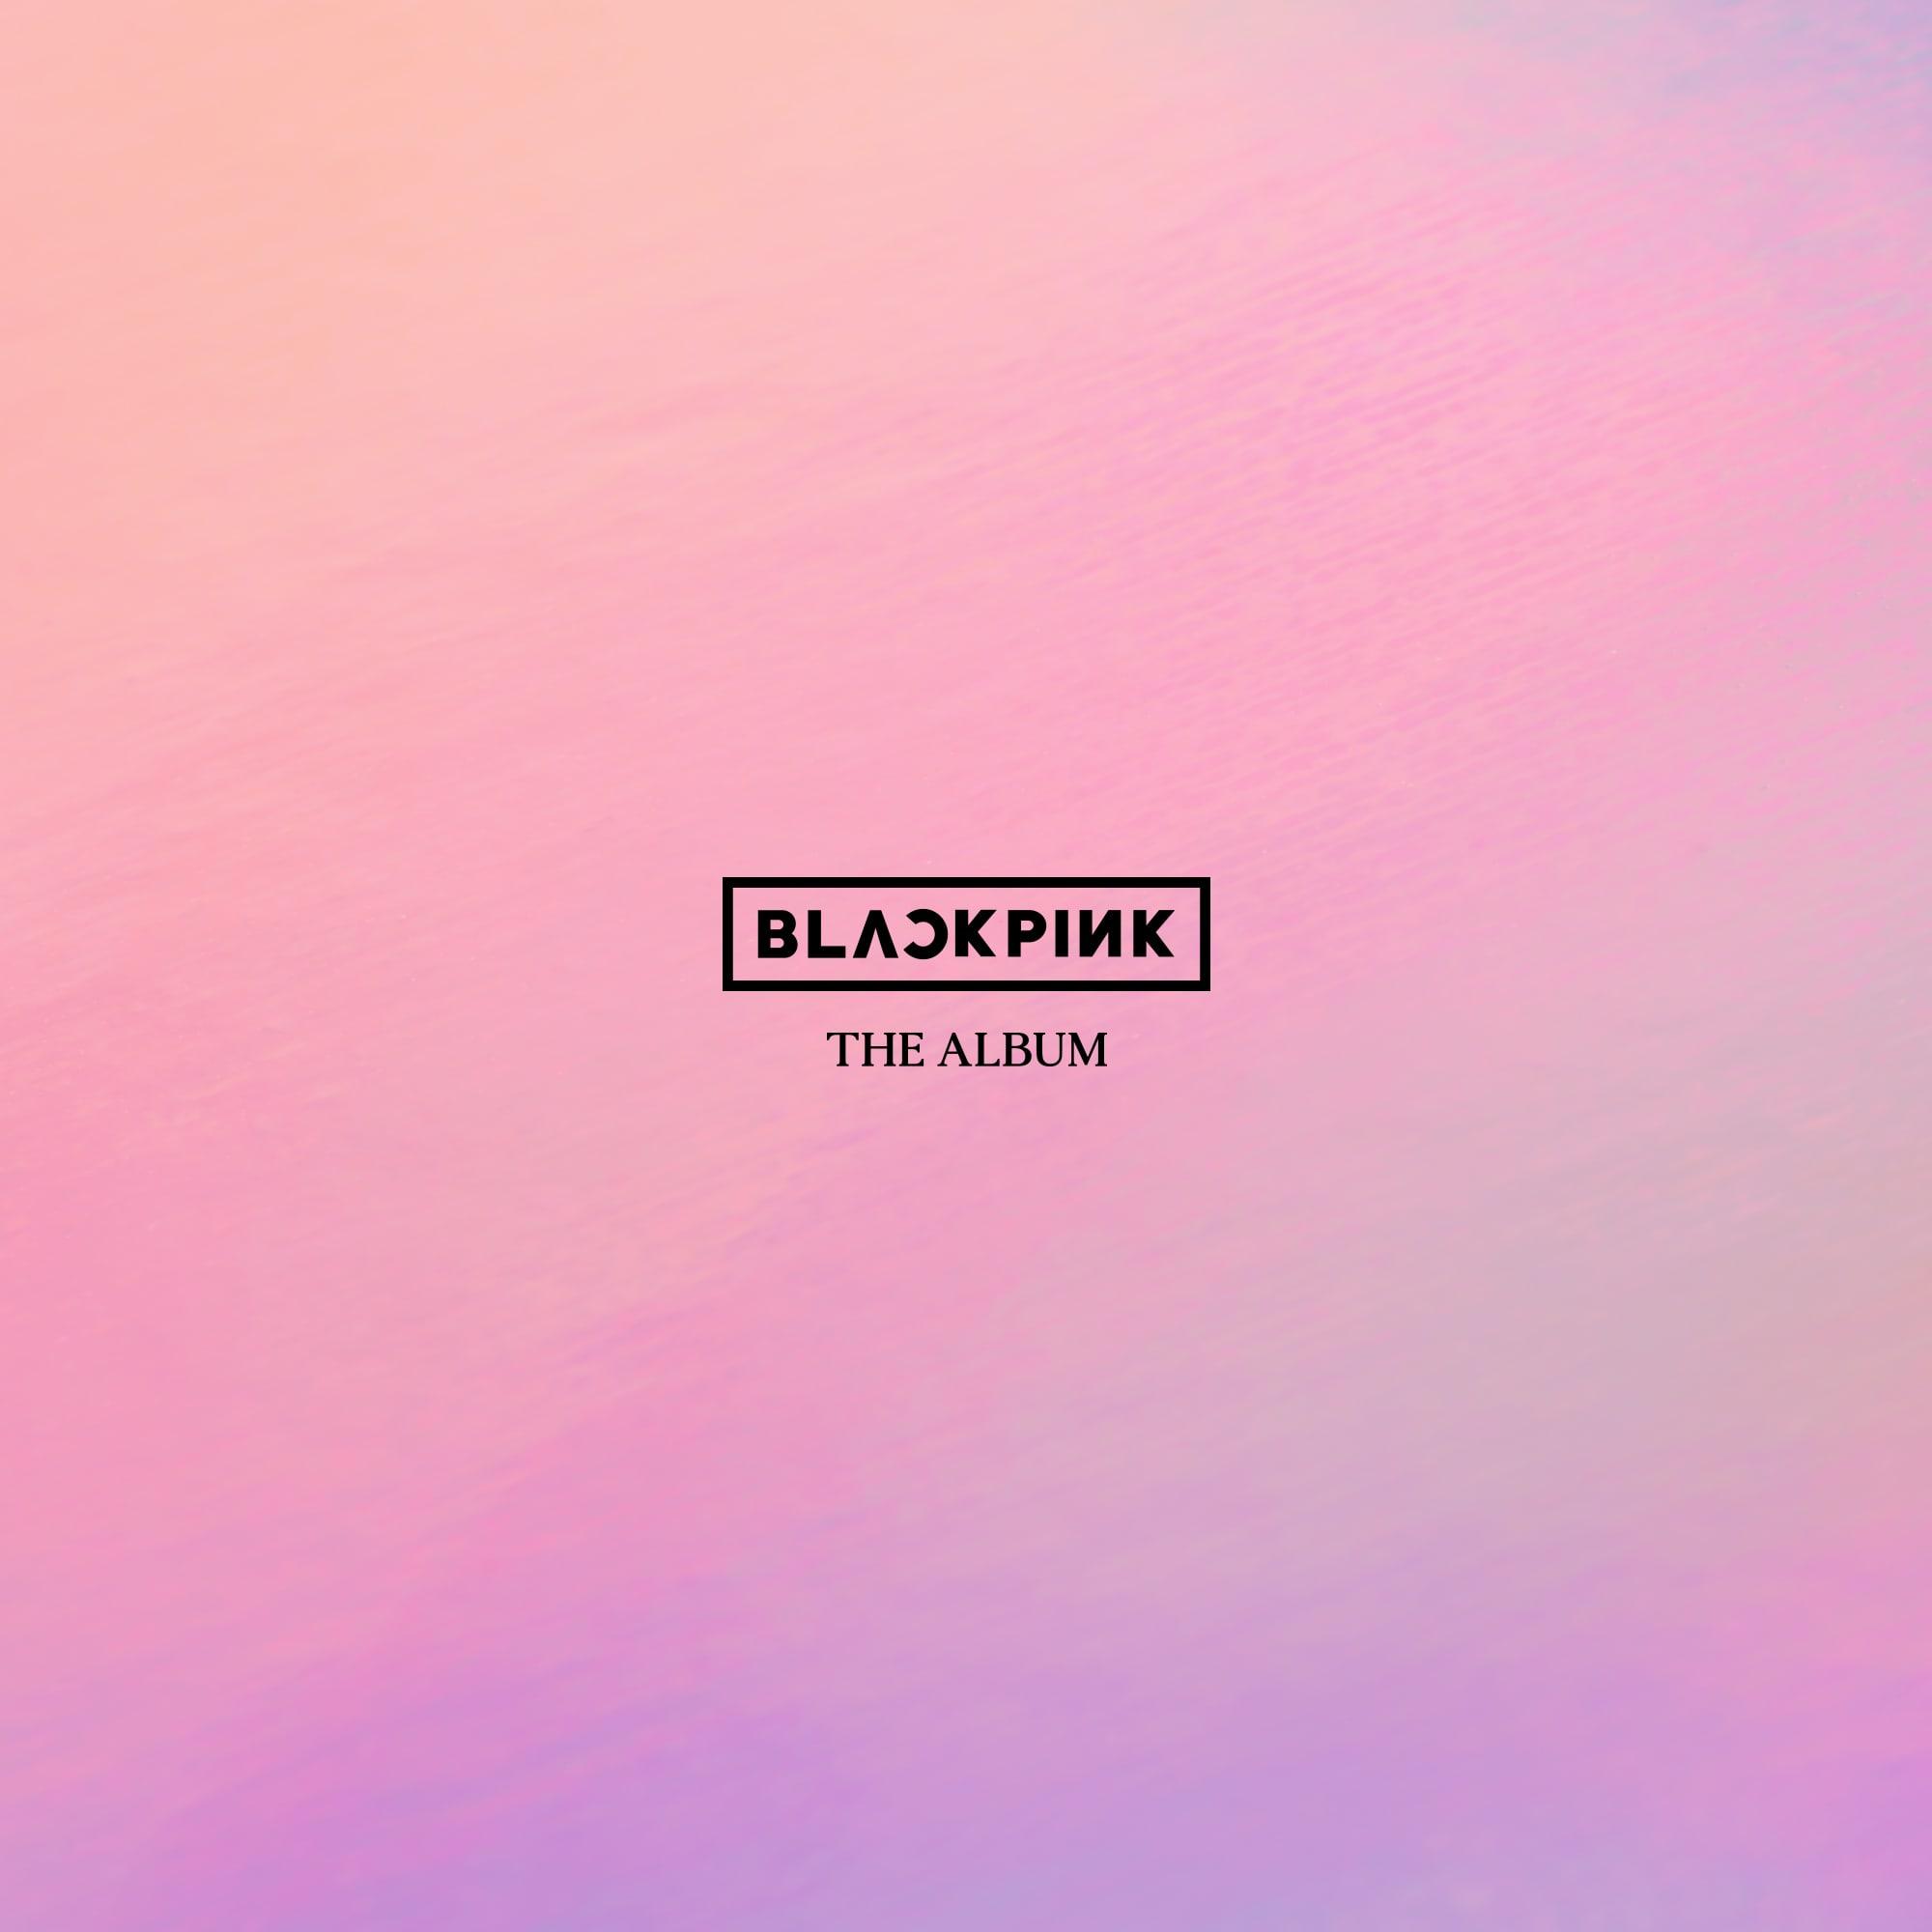 The Album Blackpink